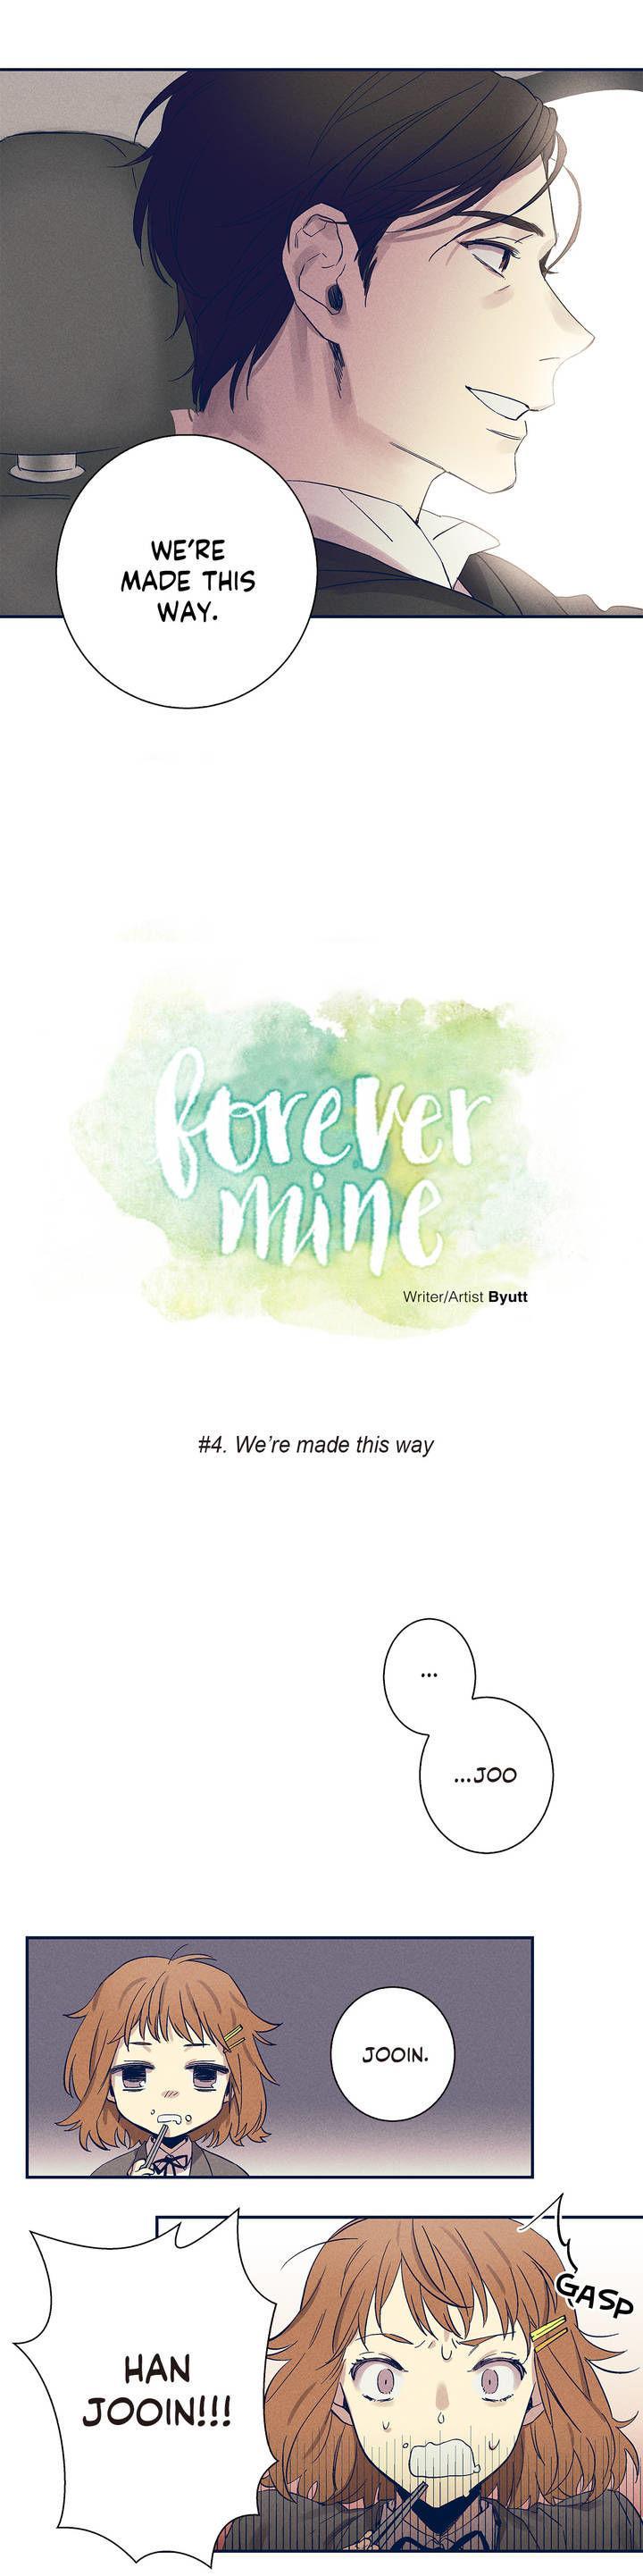 Forever Mine - Chapter 4